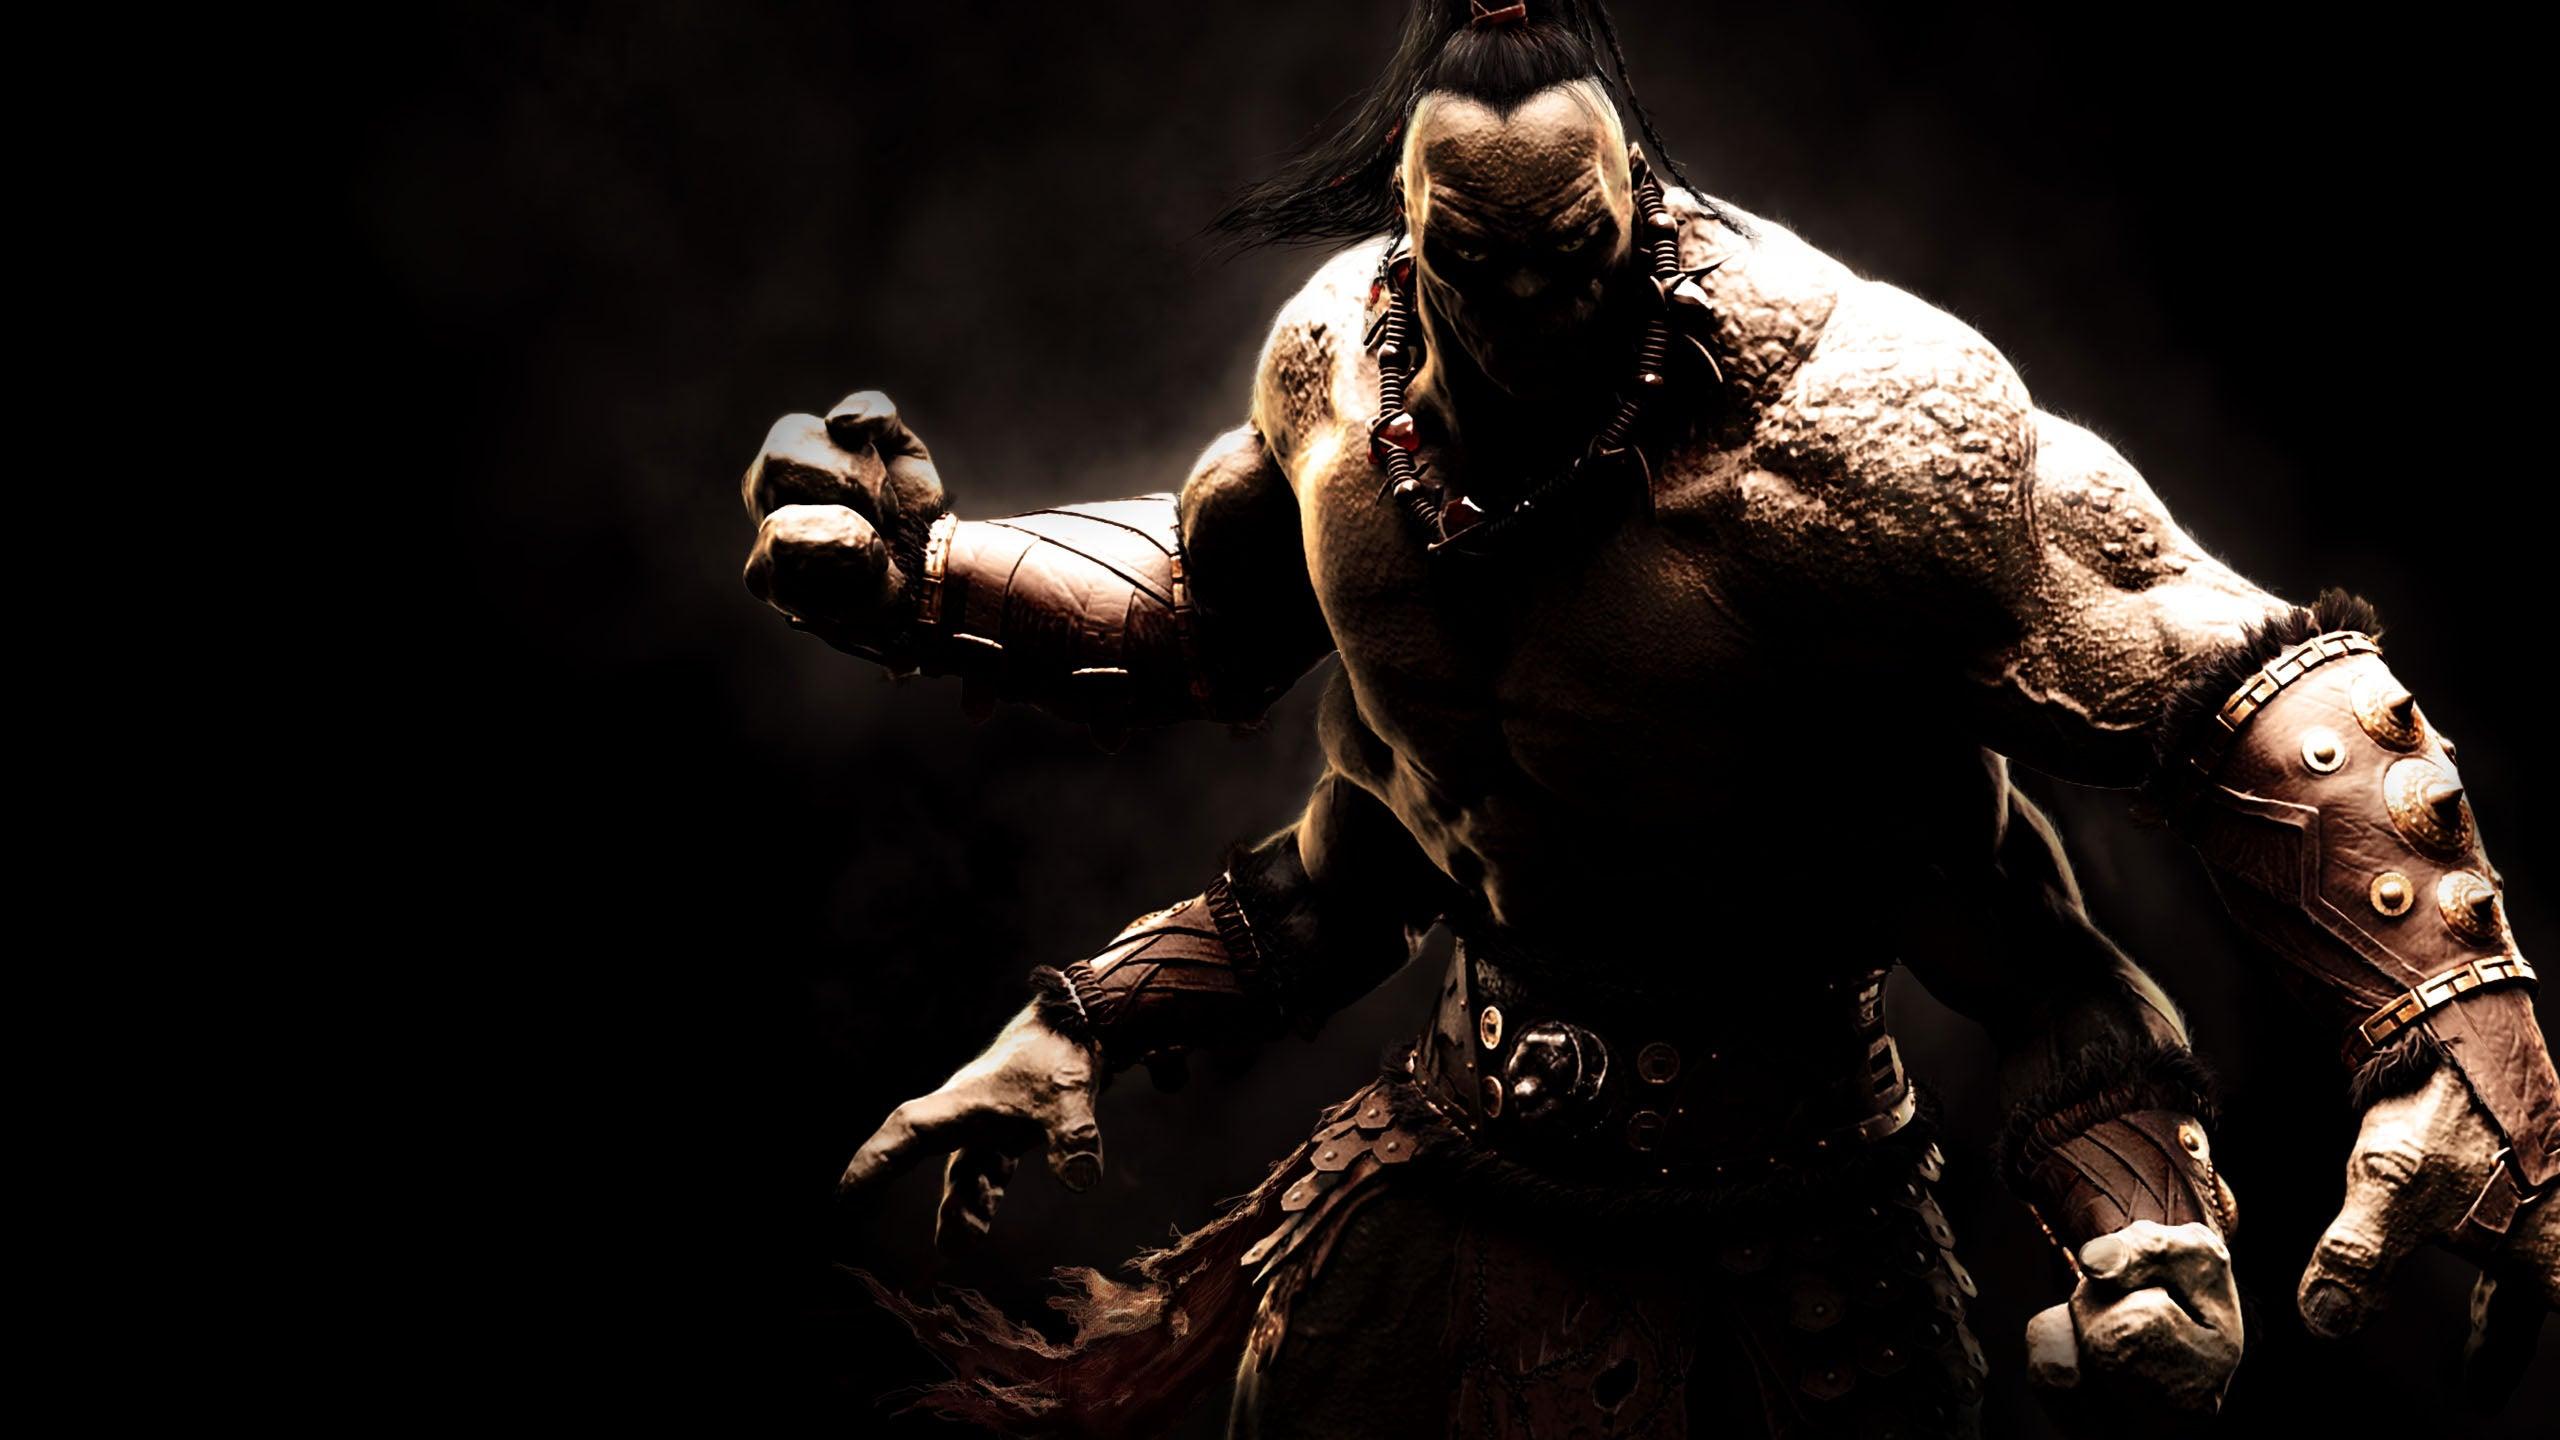 Обьявлена дата выхода Mortal Kombat X